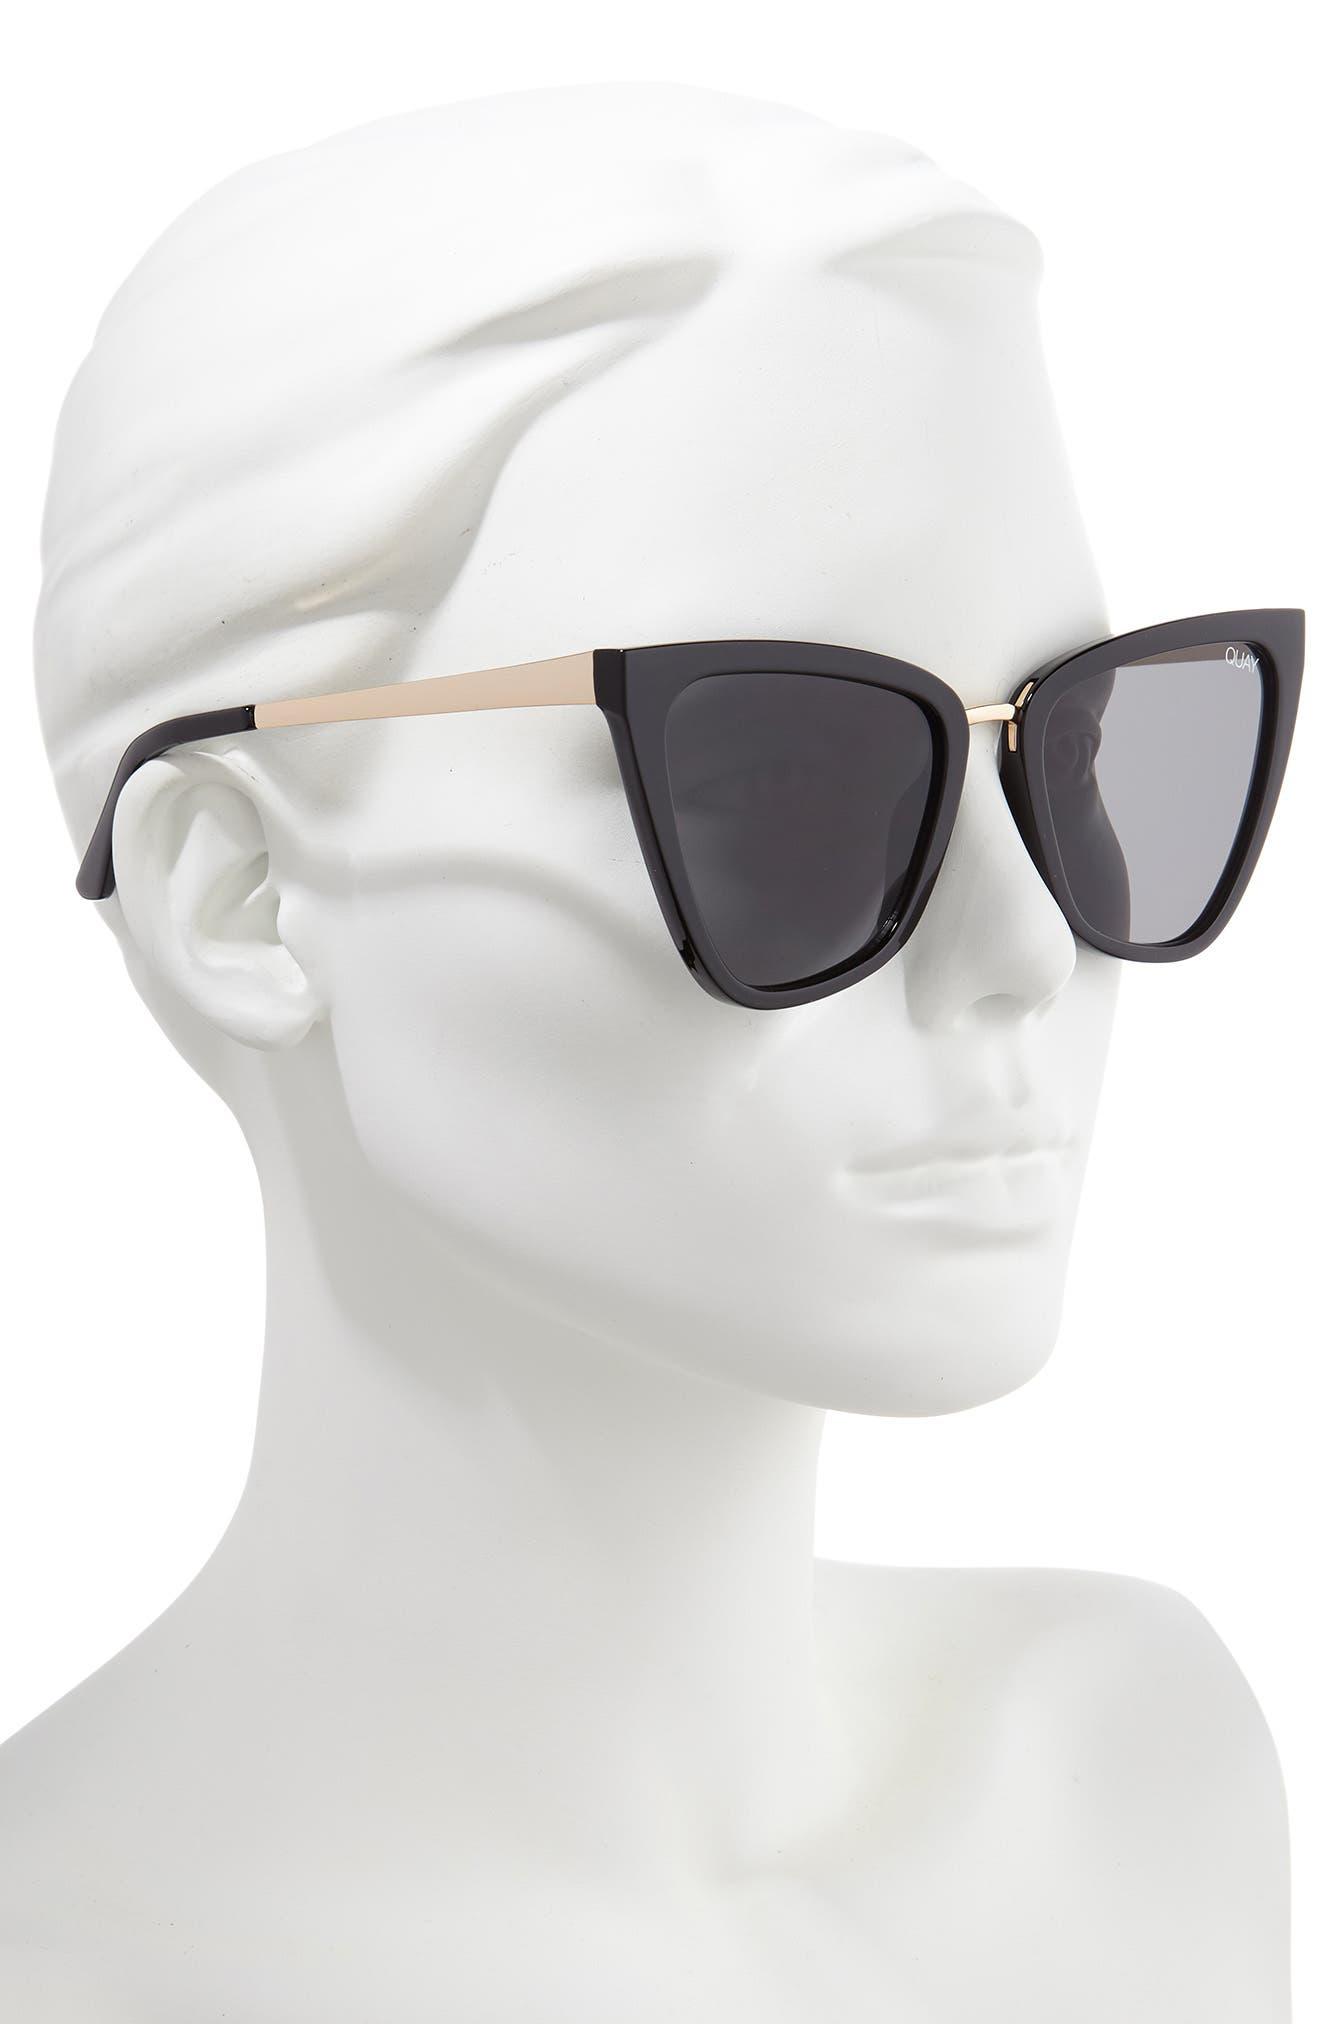 QUAY AUSTRALIA, x JLO Reina 51mm Cat Eye Sunglasses, Alternate thumbnail 2, color, BLACK / SMOKE